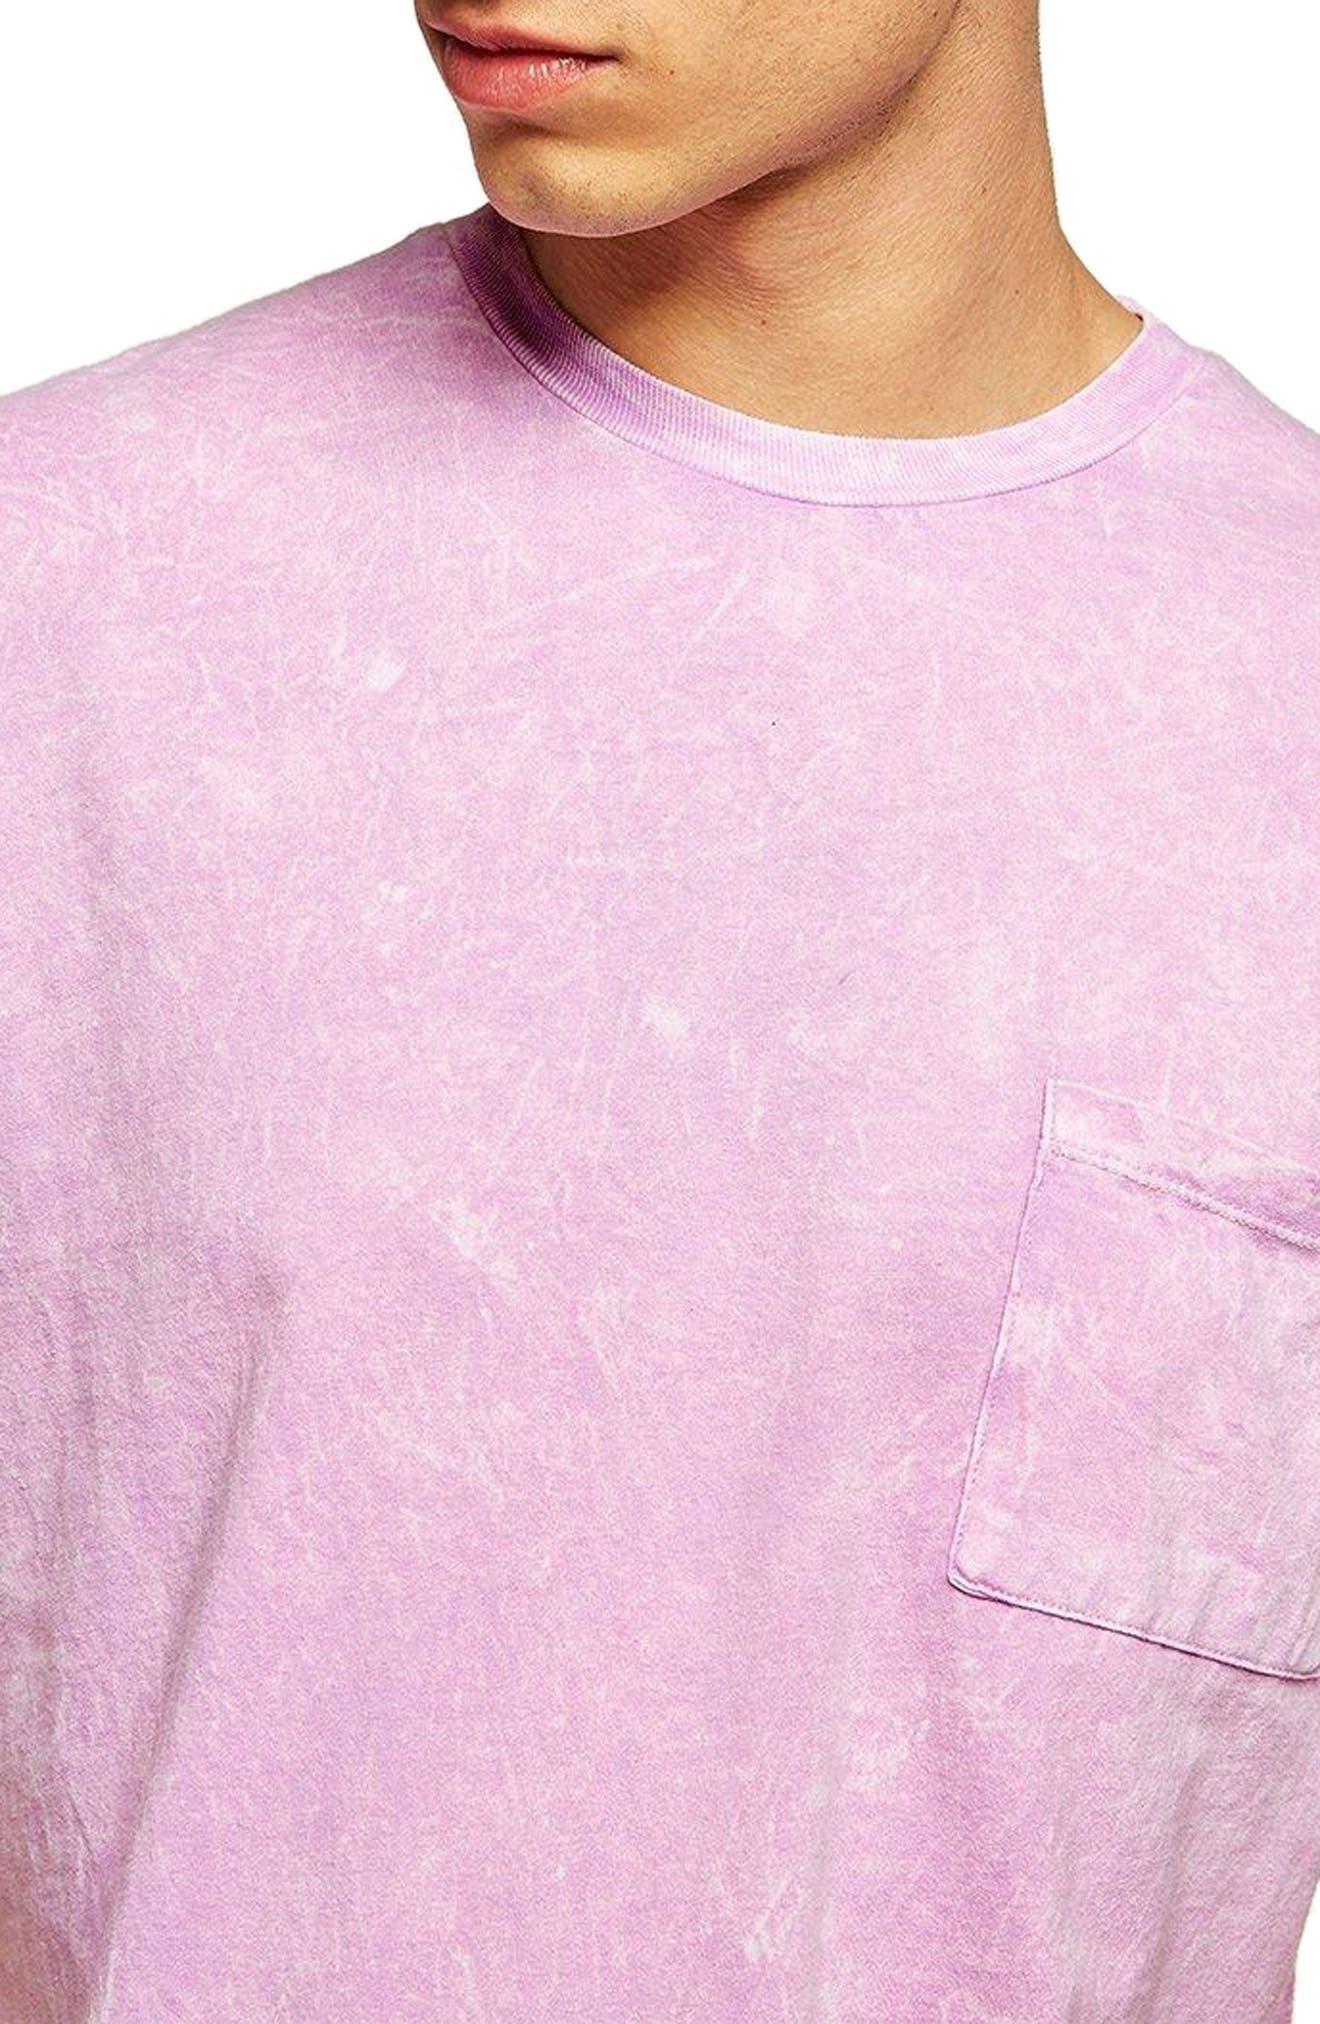 Acid Wash Pocket T-Shirt,                             Alternate thumbnail 3, color,                             Pink Multi